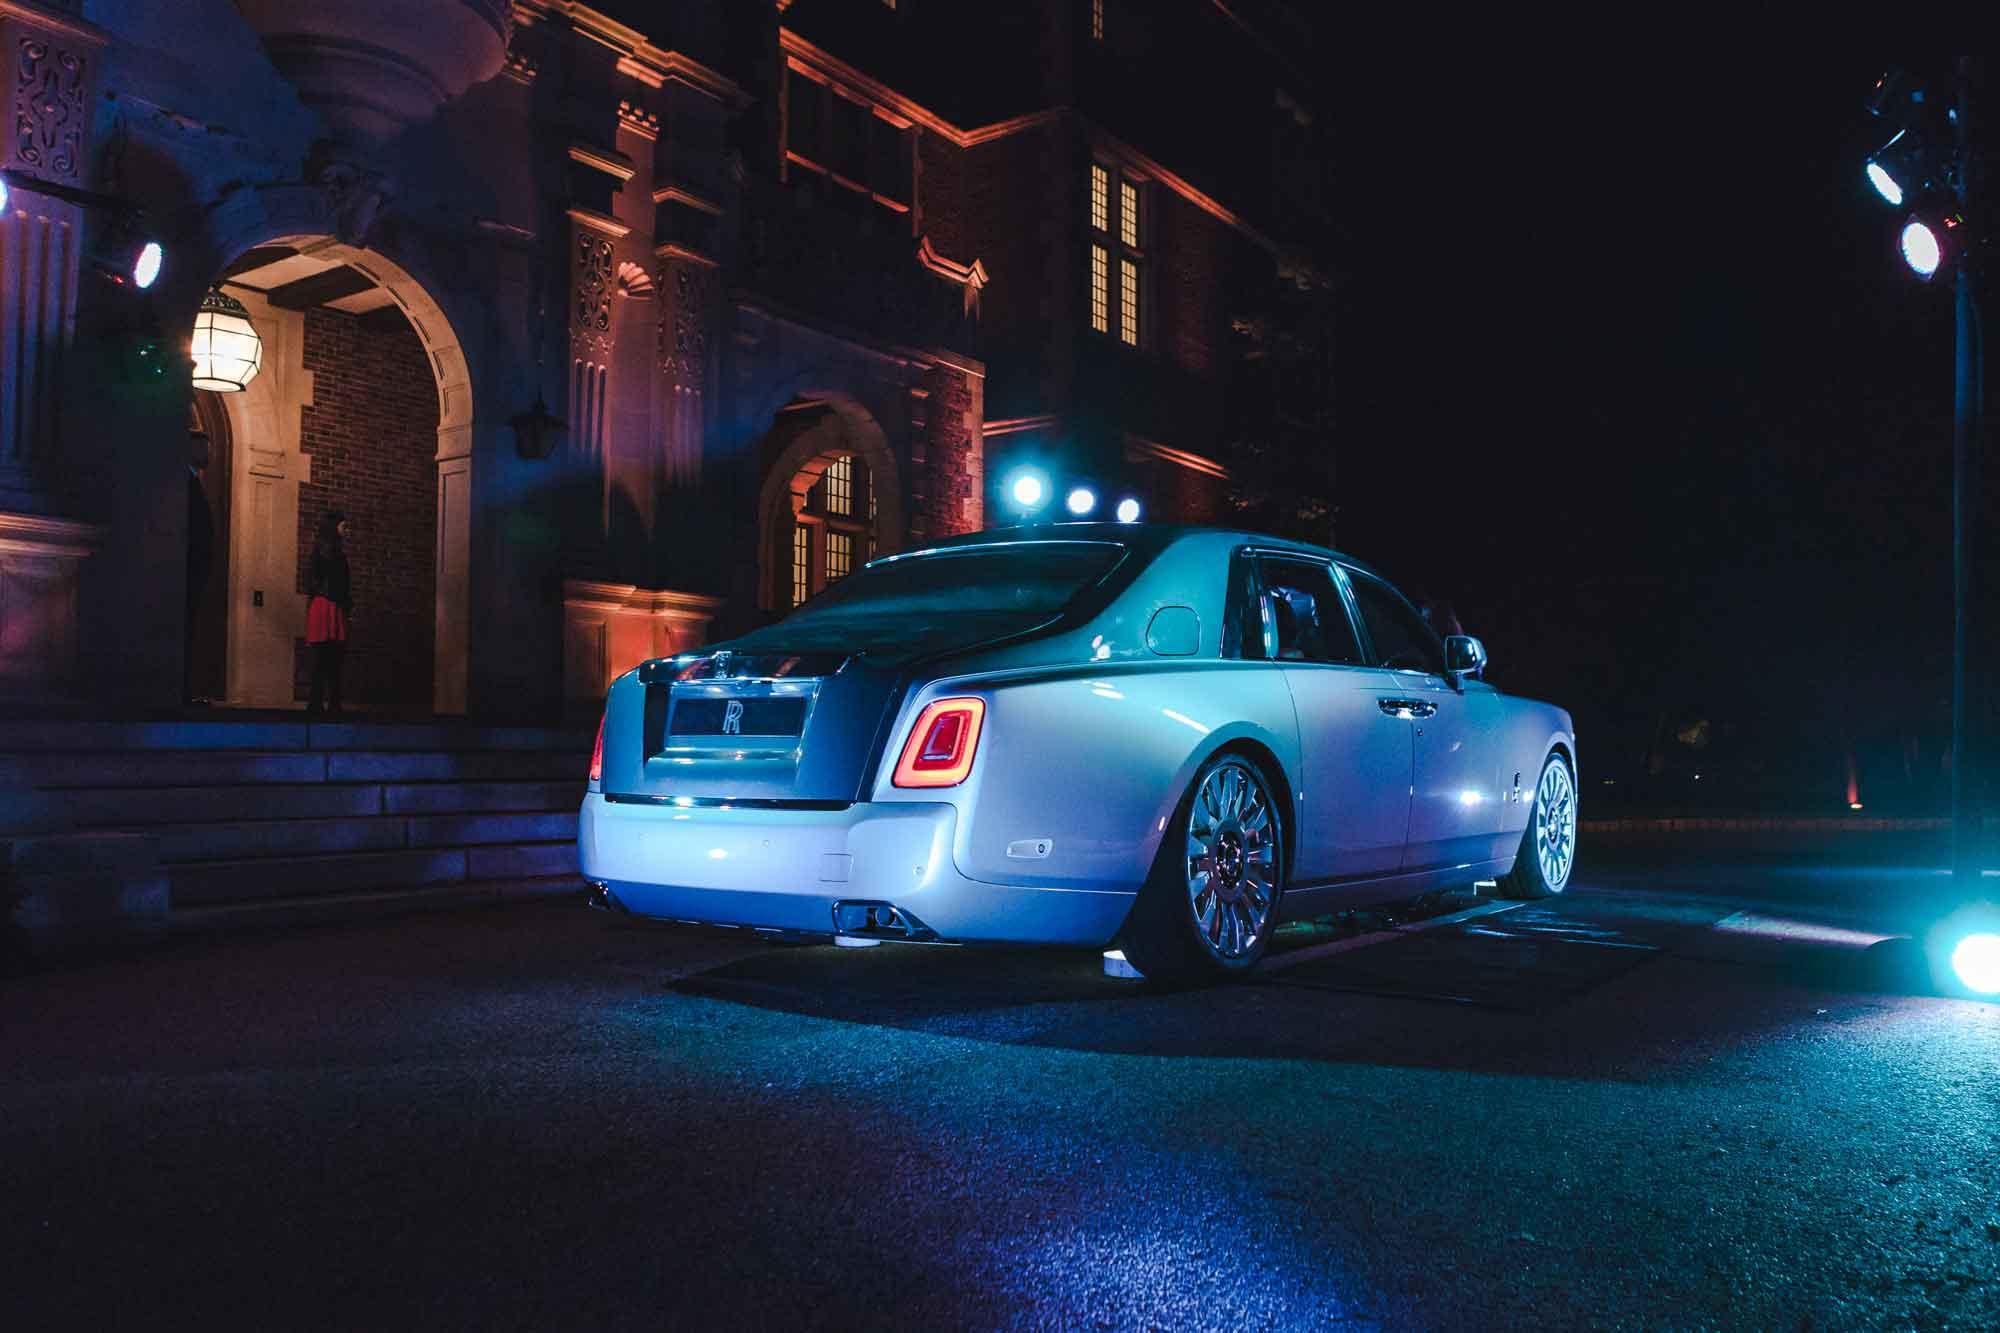 The Rolls-Royce Phantom VIII in front of the famed Darlington mansion.